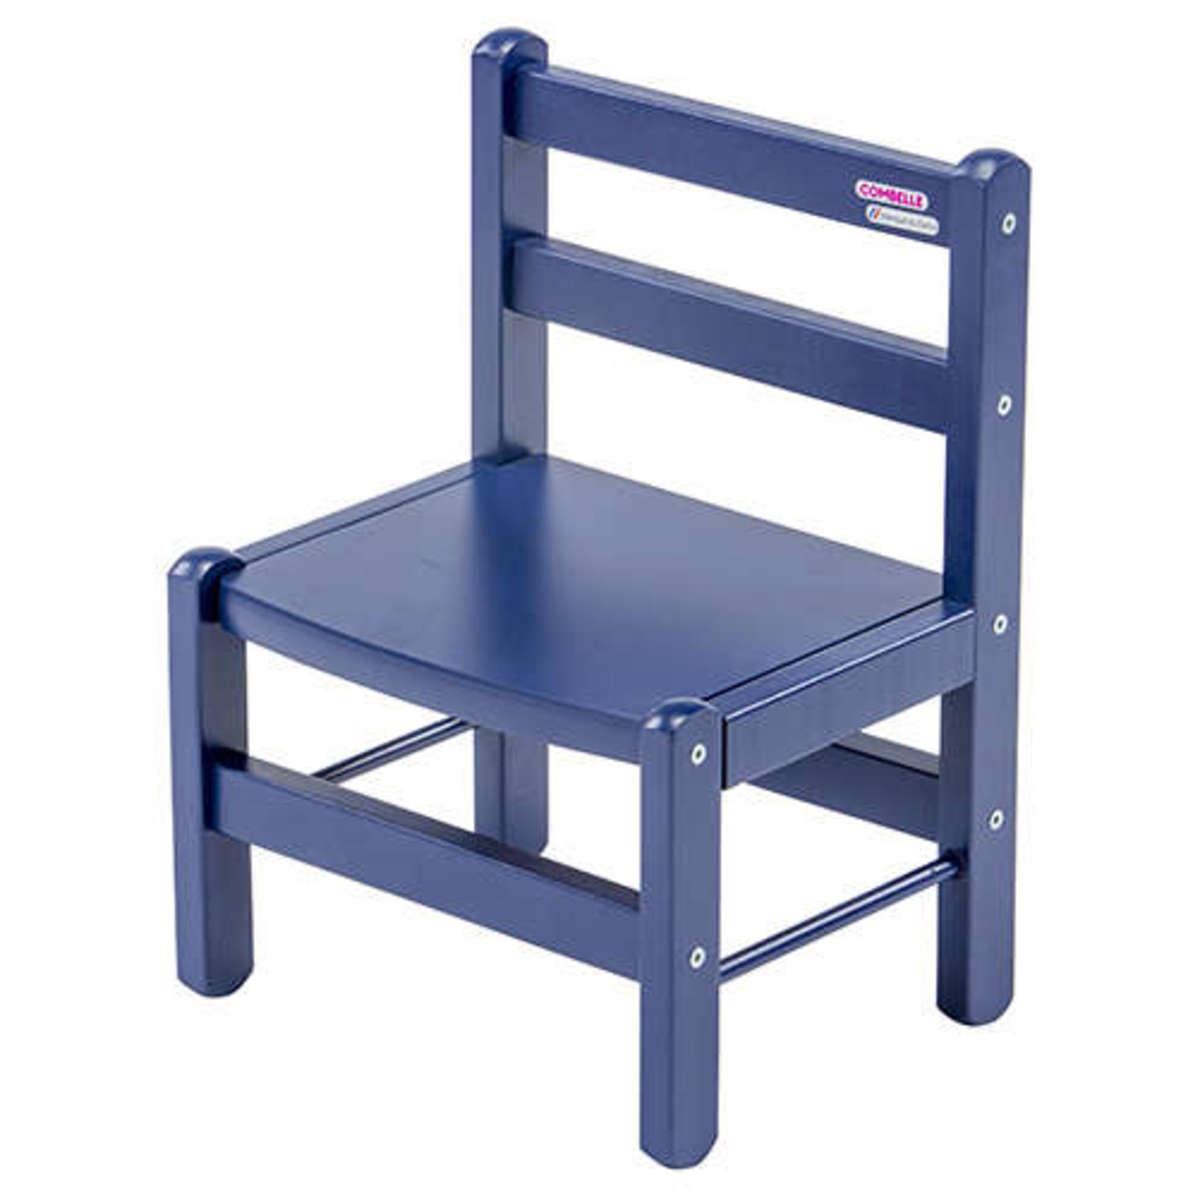 Table & Chaise Chaise Enfant - Bleu Chaise Enfant - Bleu